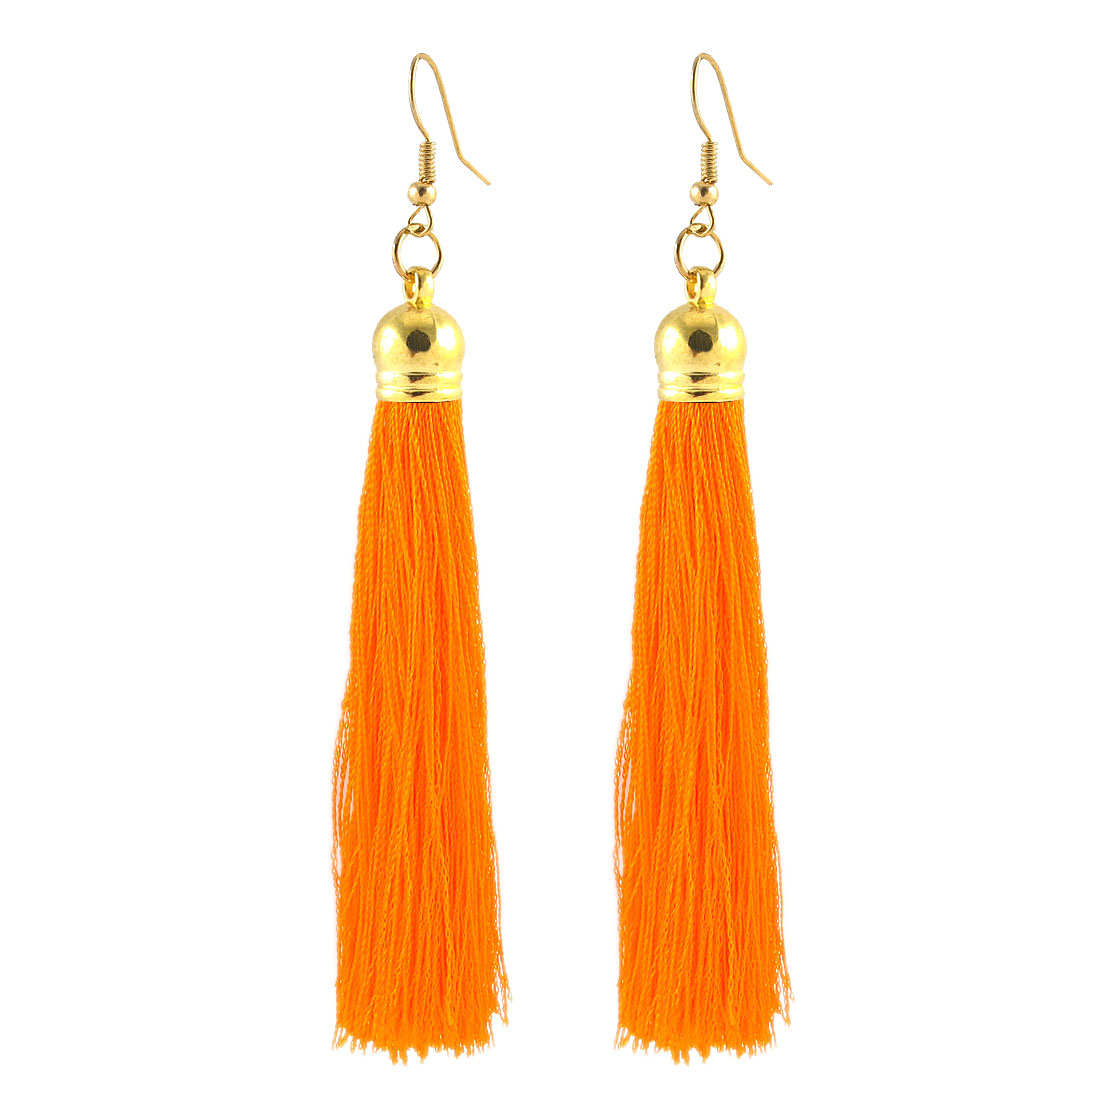 Nylon Tassel Fringe Boho Style Dangling Hook Earrings Eardrop Pair Orange